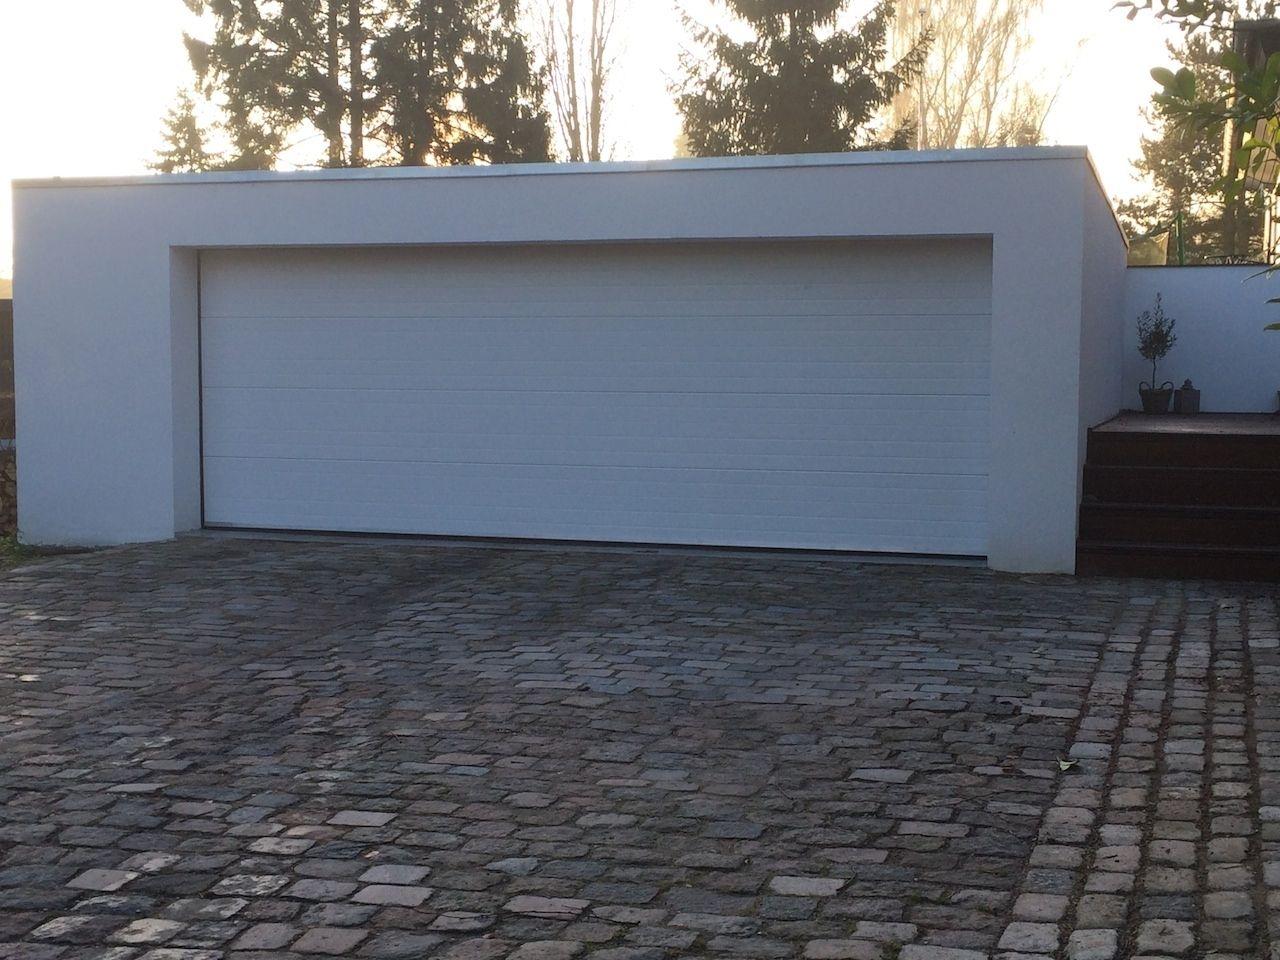 Muret garage google s gning garage pinterest for Garage pons muret